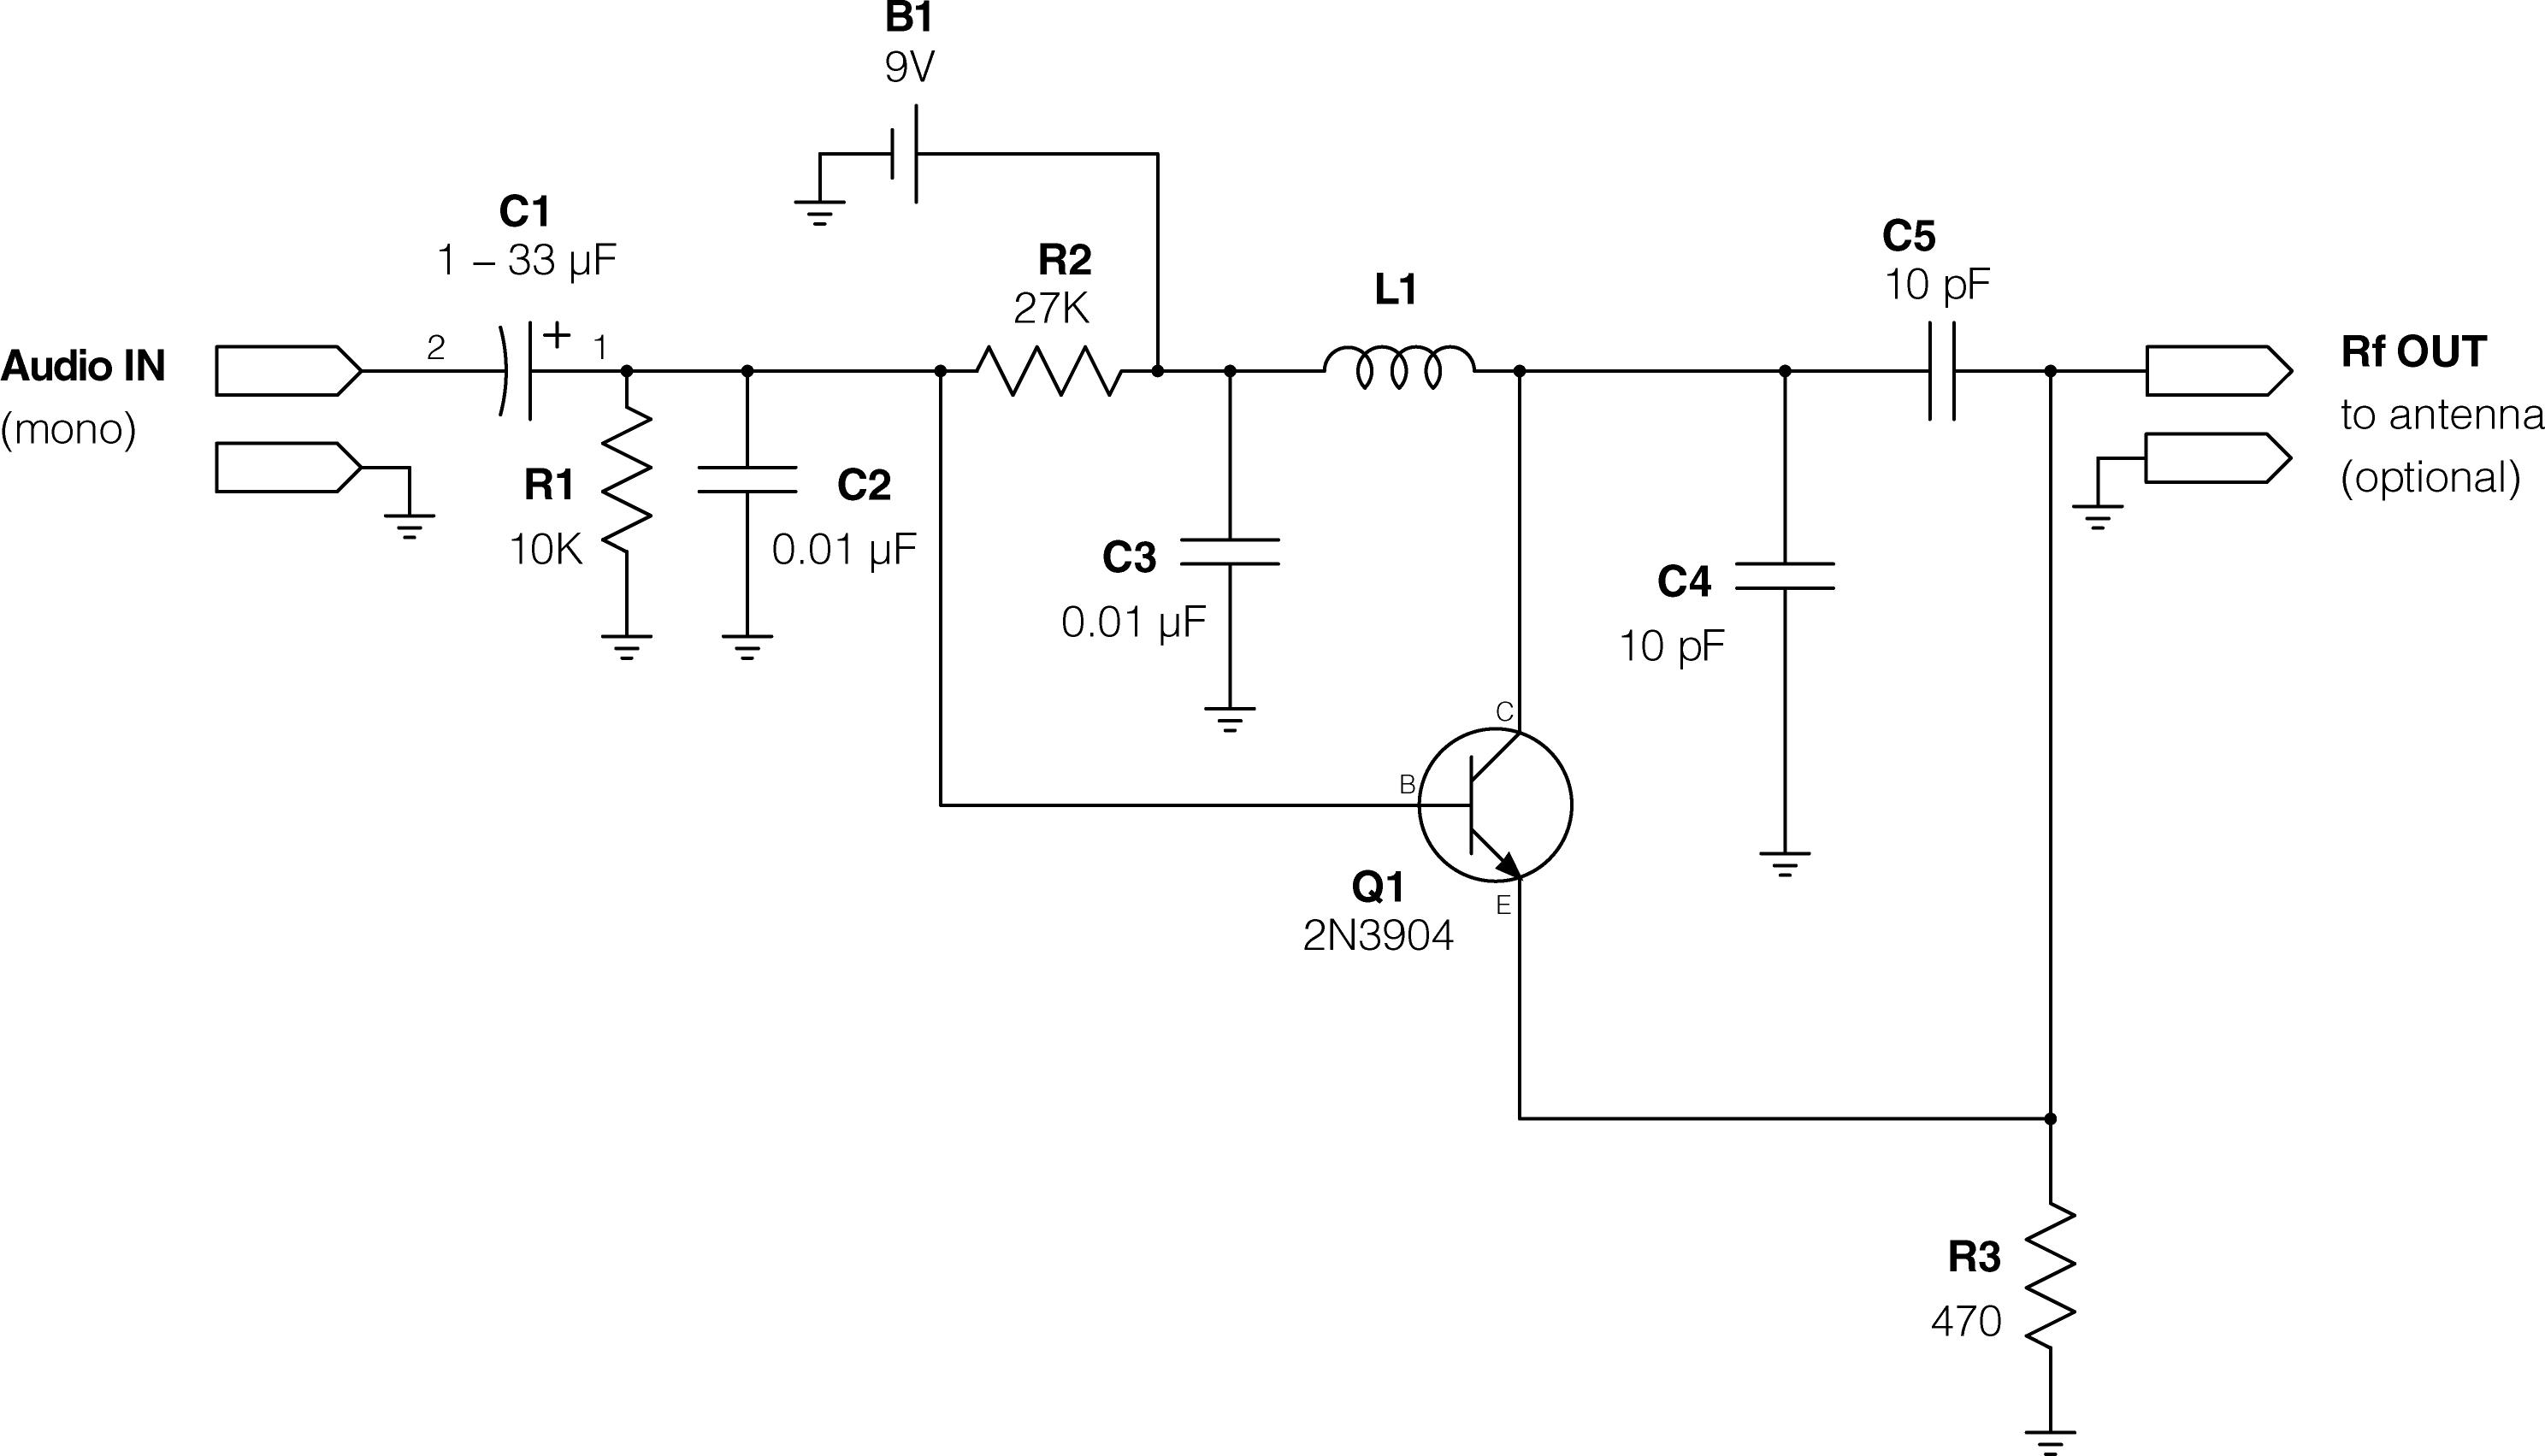 Simple Fm Transmitter Circuit Diagram 37 Wiring Images Wireless Microphone By Max4467 Kogawa Simplest Transmitterresize6202c354 Super Ipod Make